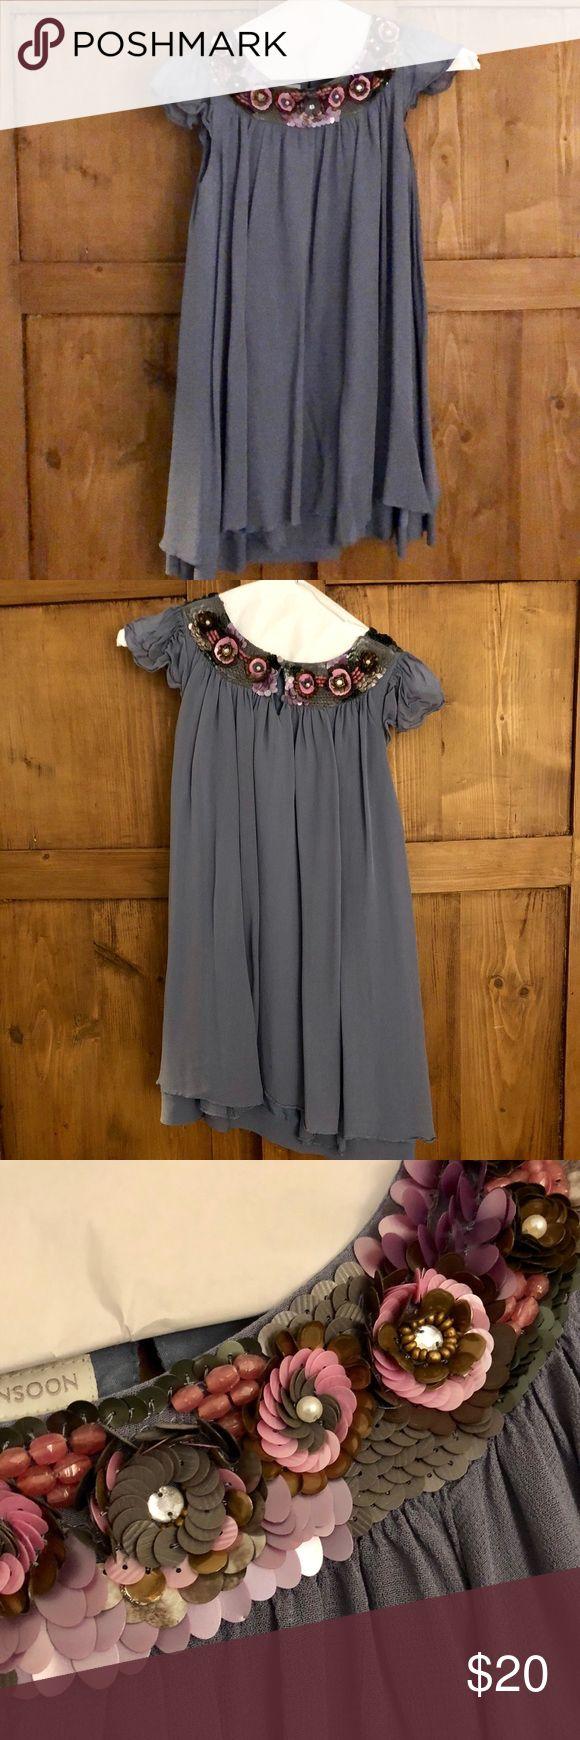 Monsoon Gurls dress Purplish grey beaded dress Monsoon Dresses Formal #MonsoonIsHere